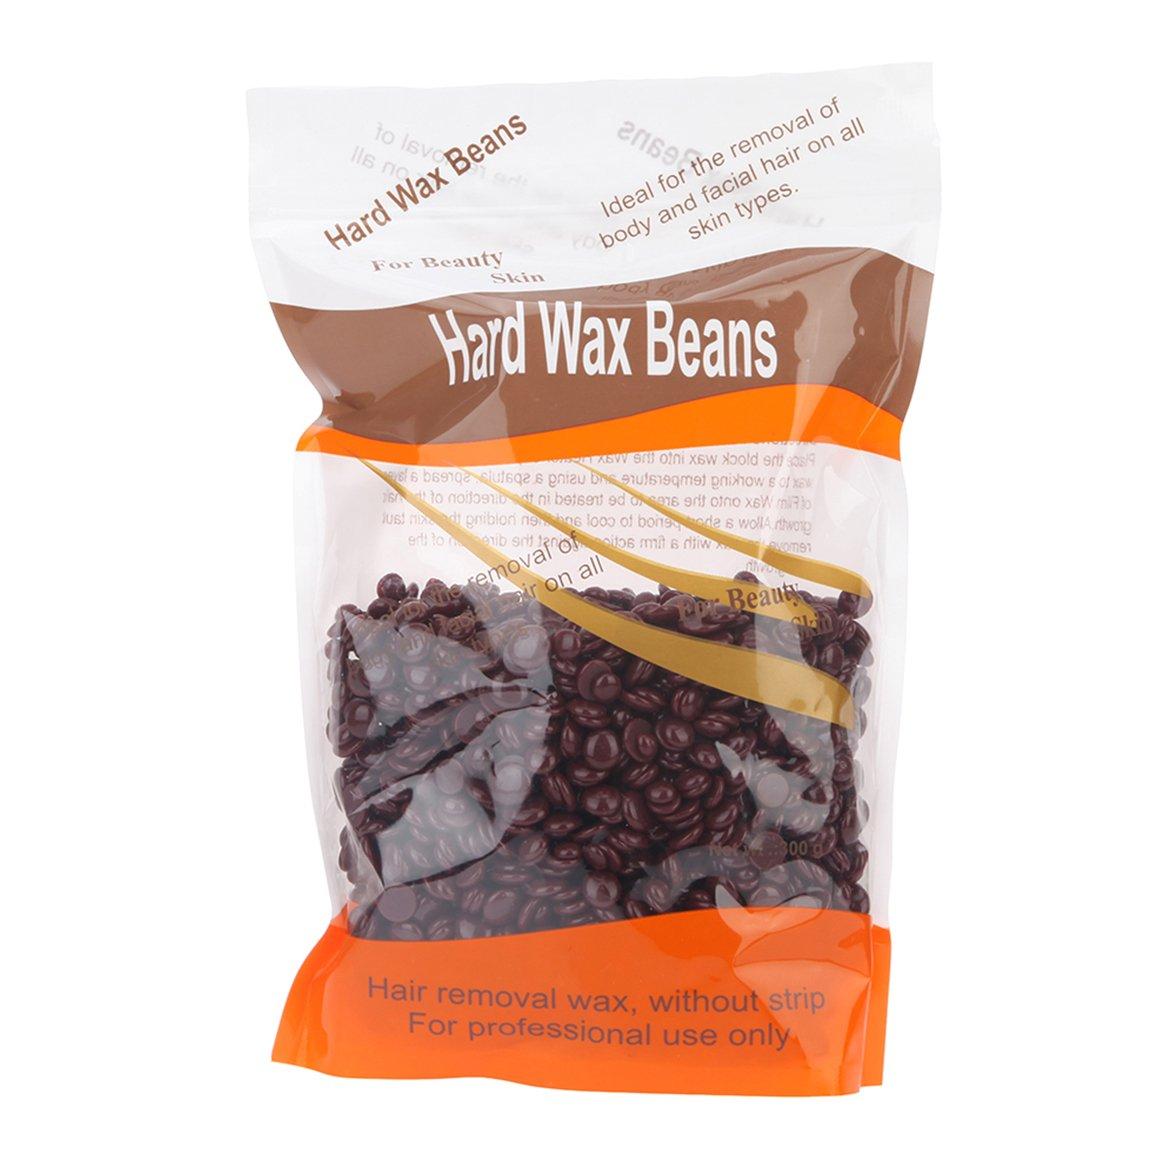 Korlin Hard Wax Beans for Face, Underarms, Brazilian, Bikini Hair Remover 10.6 Ounce (Chocolate)